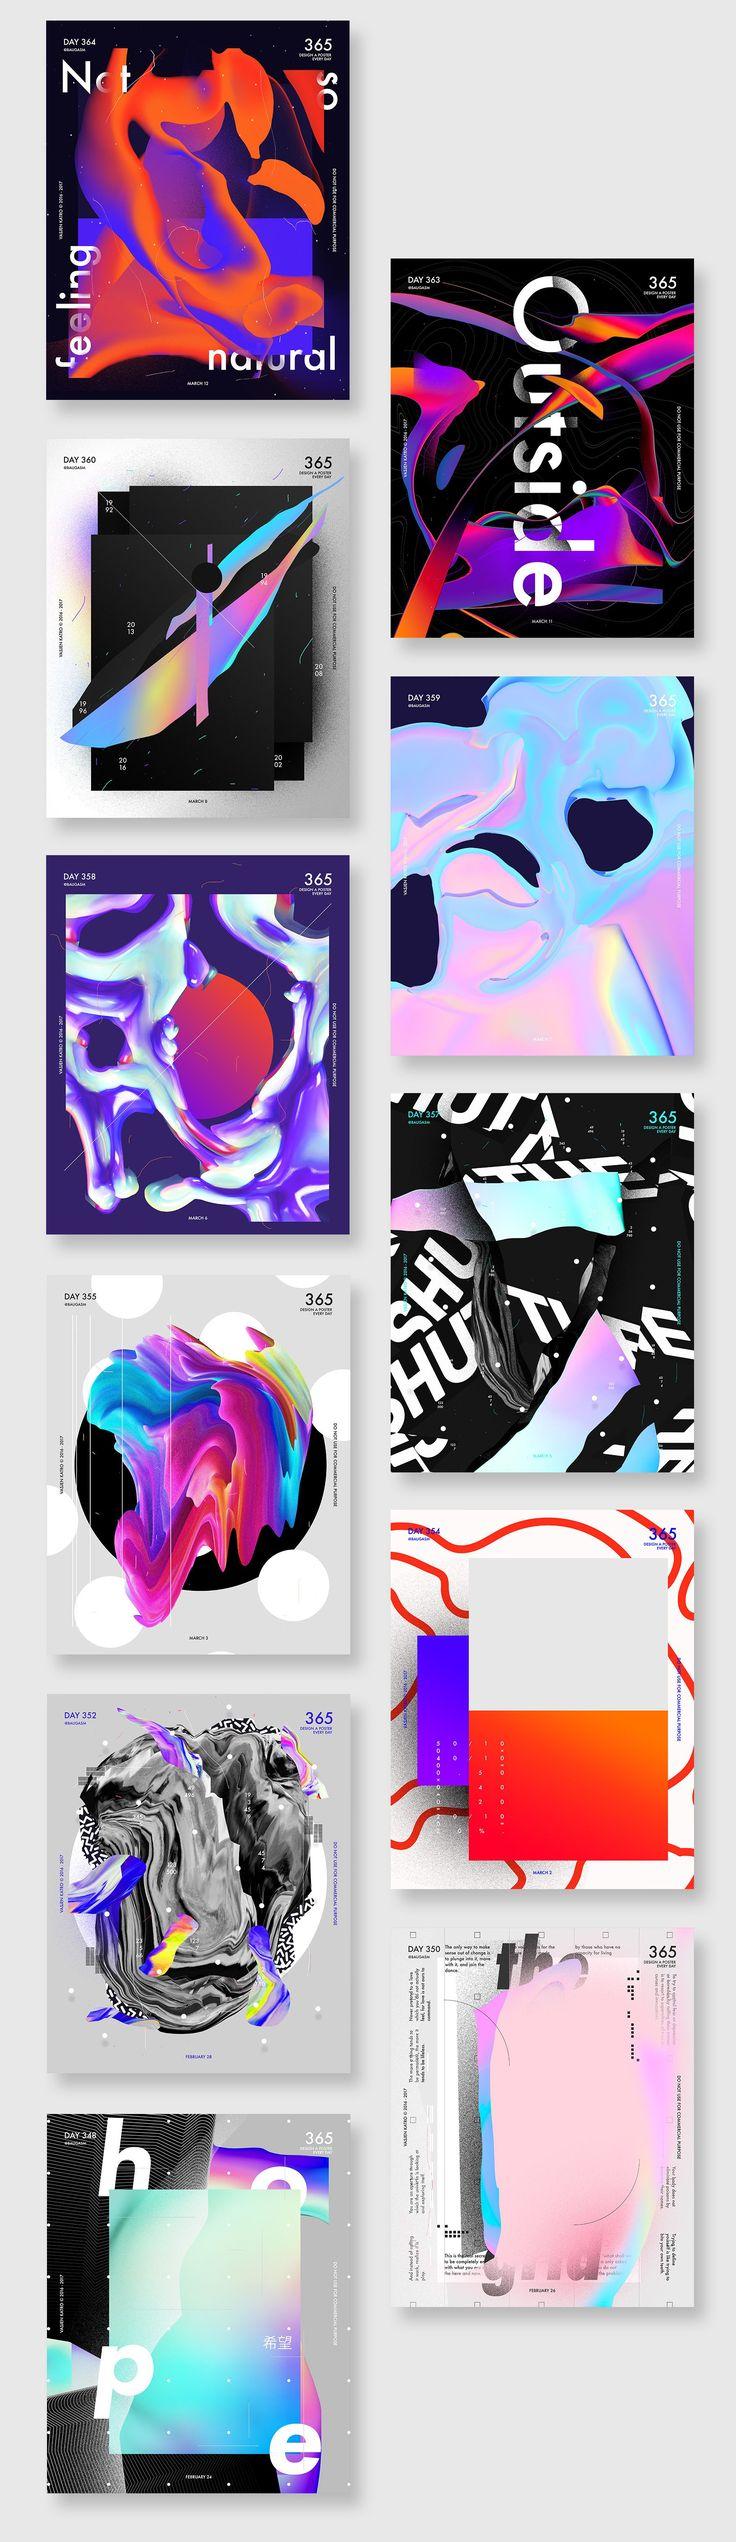 Poster design 2017 - Graphic Design Baugasm 365 Posters